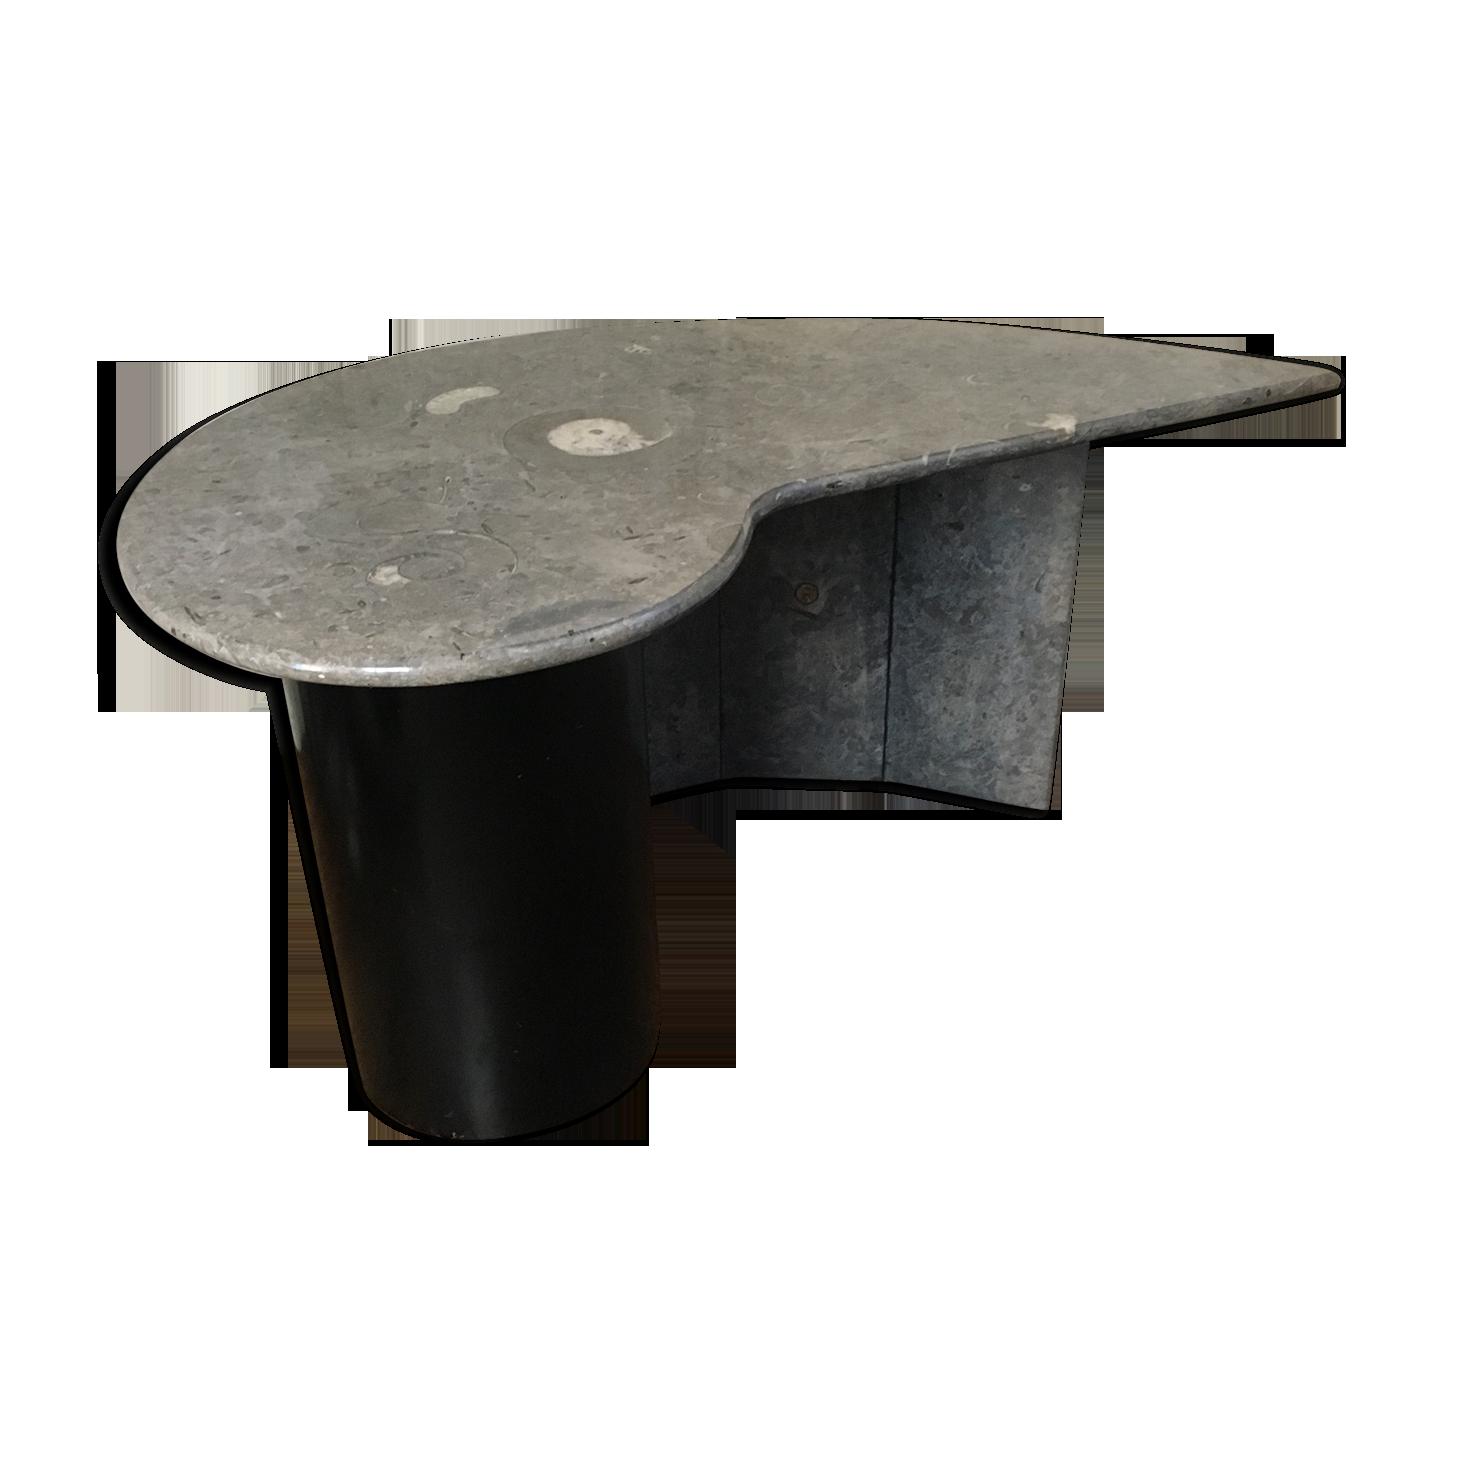 Bureau en marbre forme libre marbre gris design gqx k